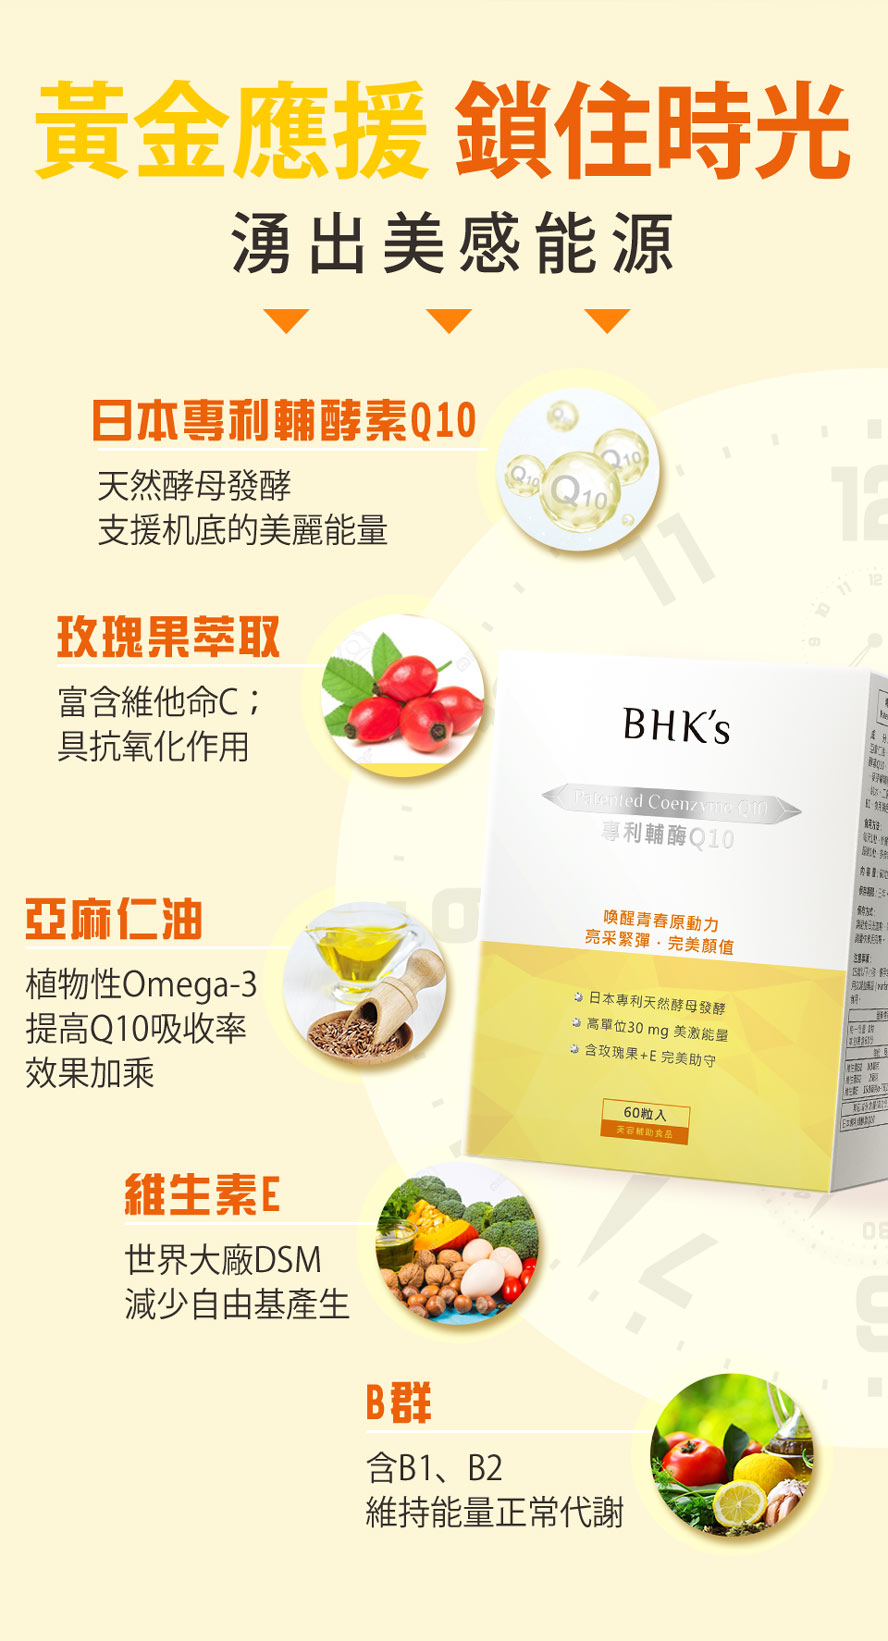 BHK's輔酶Q10+E使用日本專利天然酵母發酵,支援肌底美麗